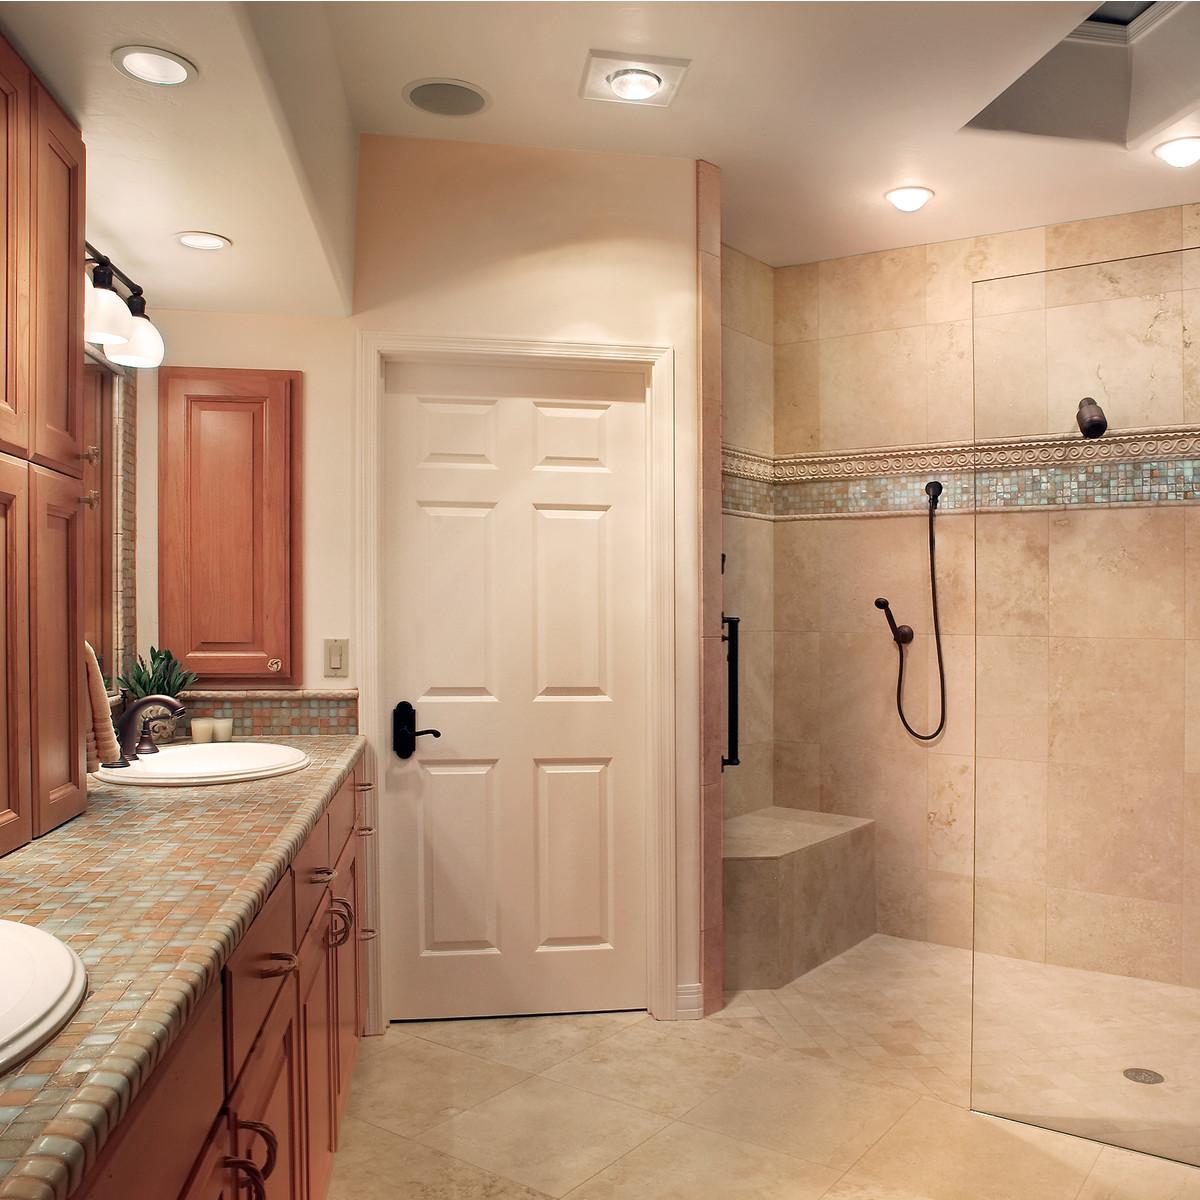 Bathroom Update Design Ideas   Walk In Shower, Tile Counter.